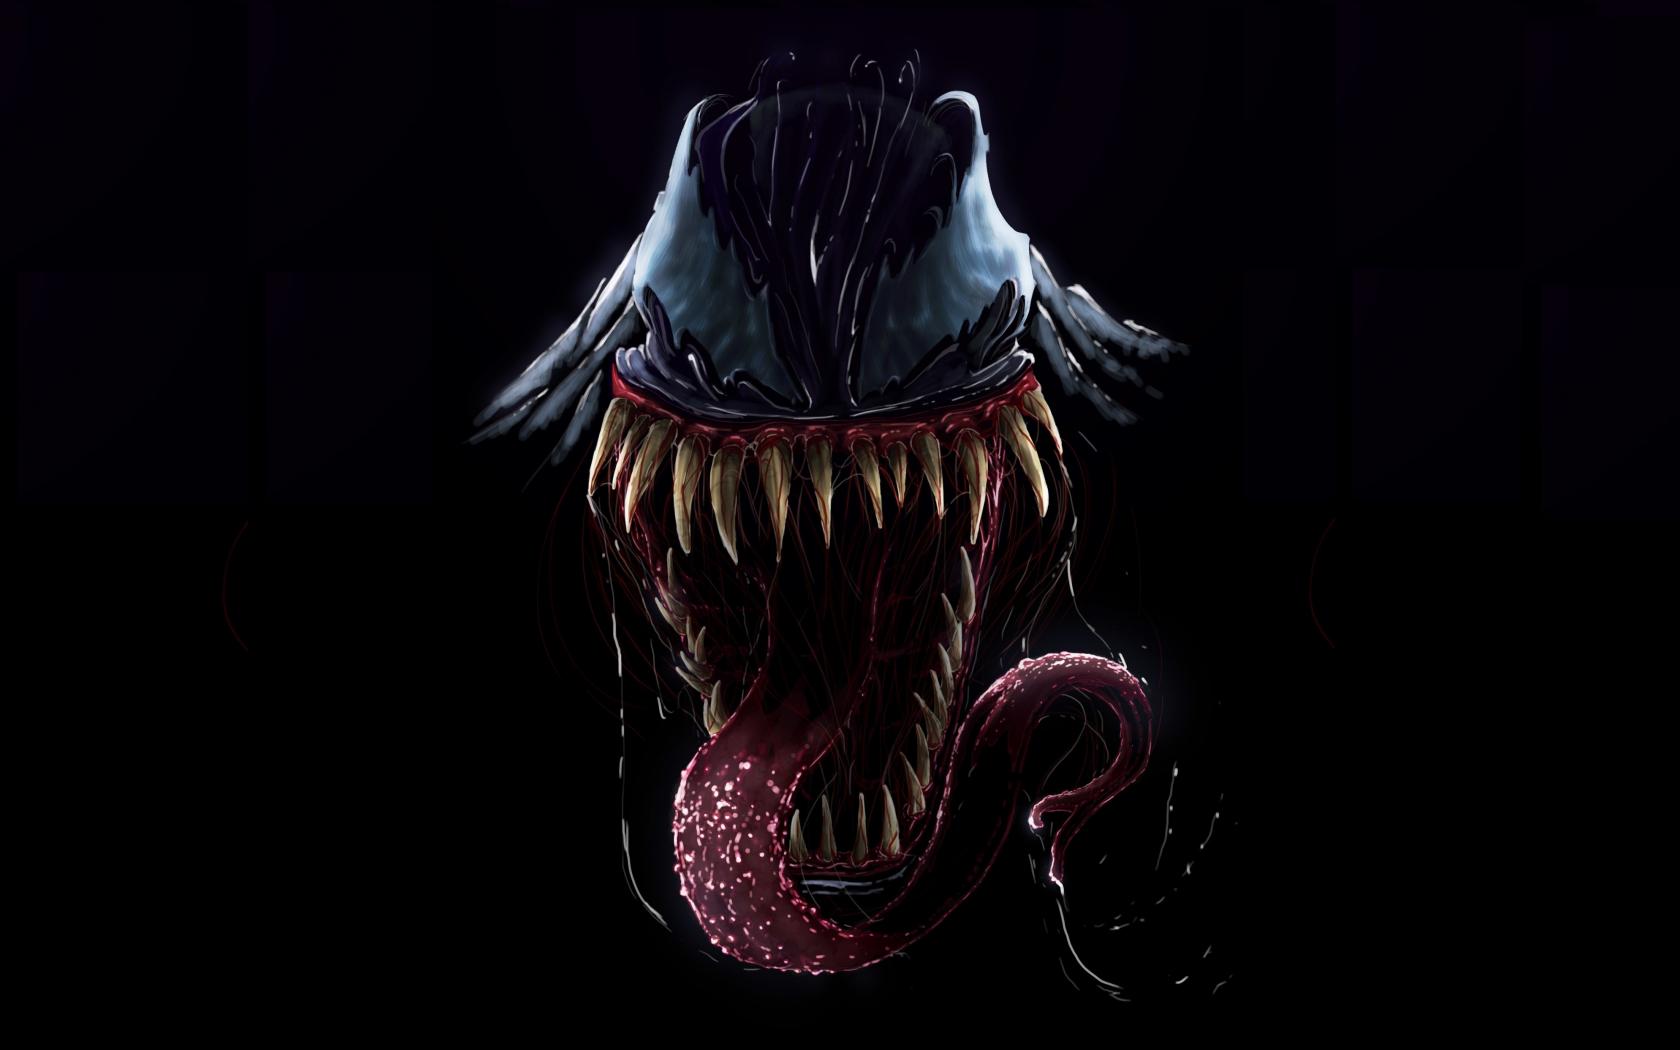 1680x1050 Playerunknowns Battlegrounds Artwork 1680x1050: Download 1680x1050 Wallpaper Artwork, Villain, Venom